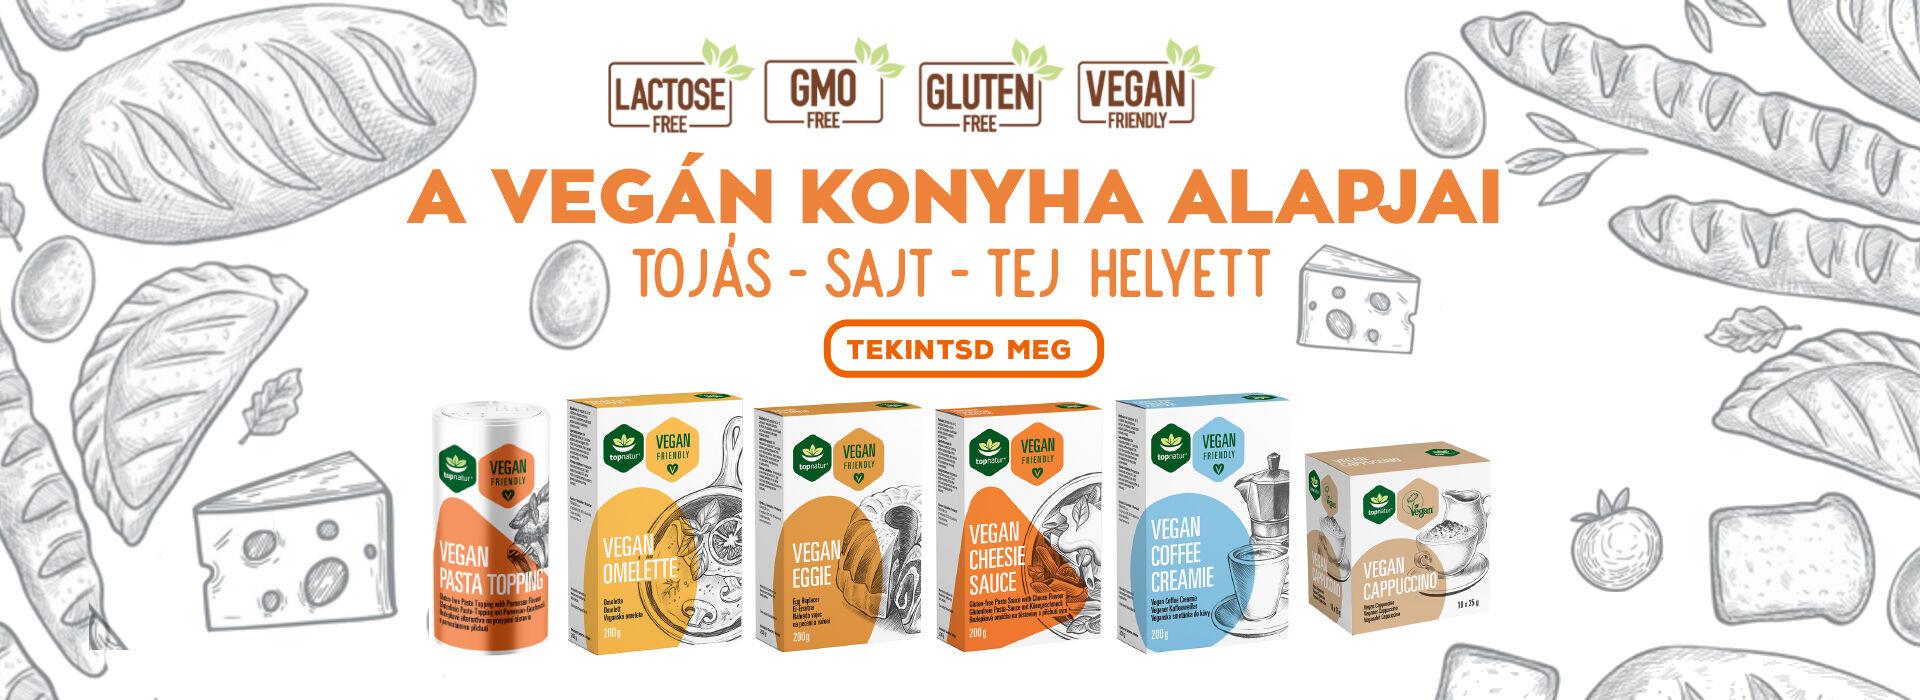 vegan banner2